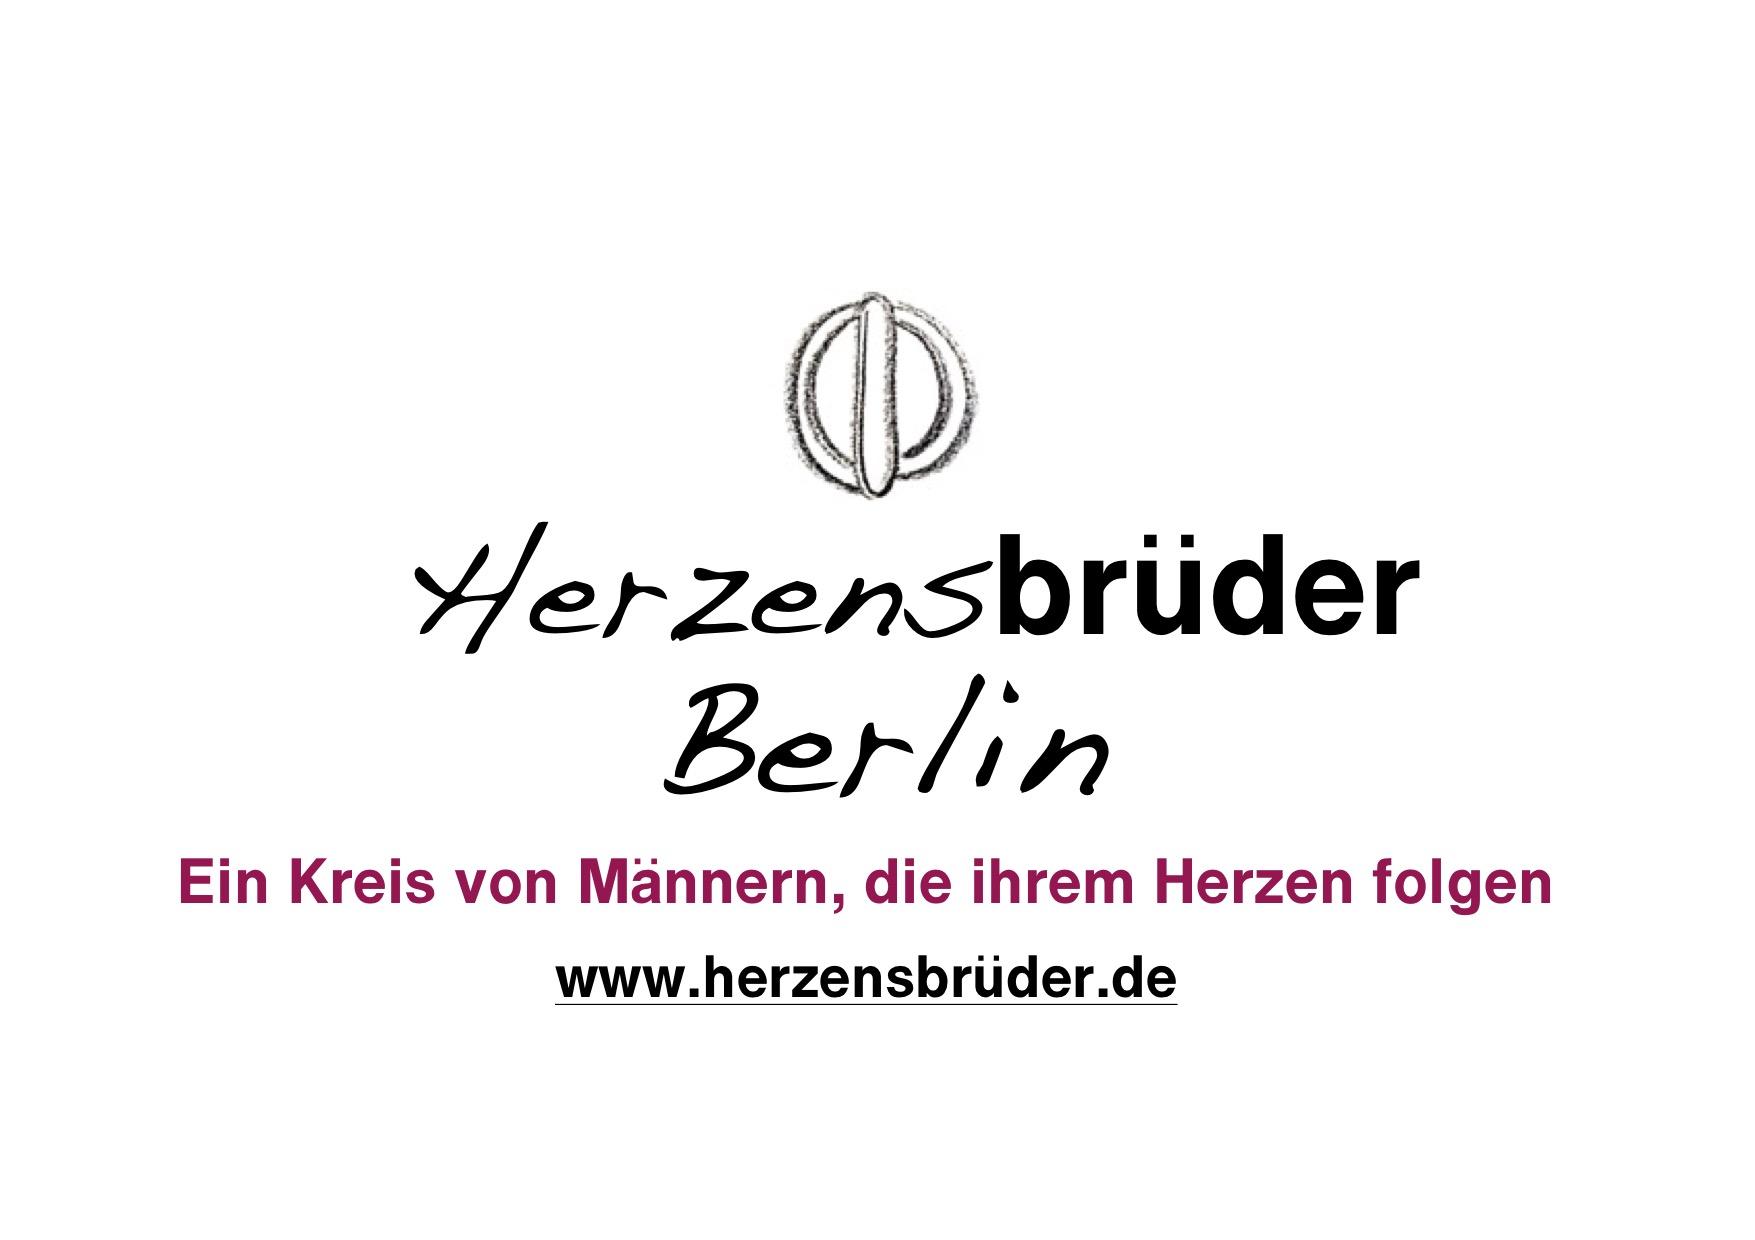 Herzensbrüder Berlin